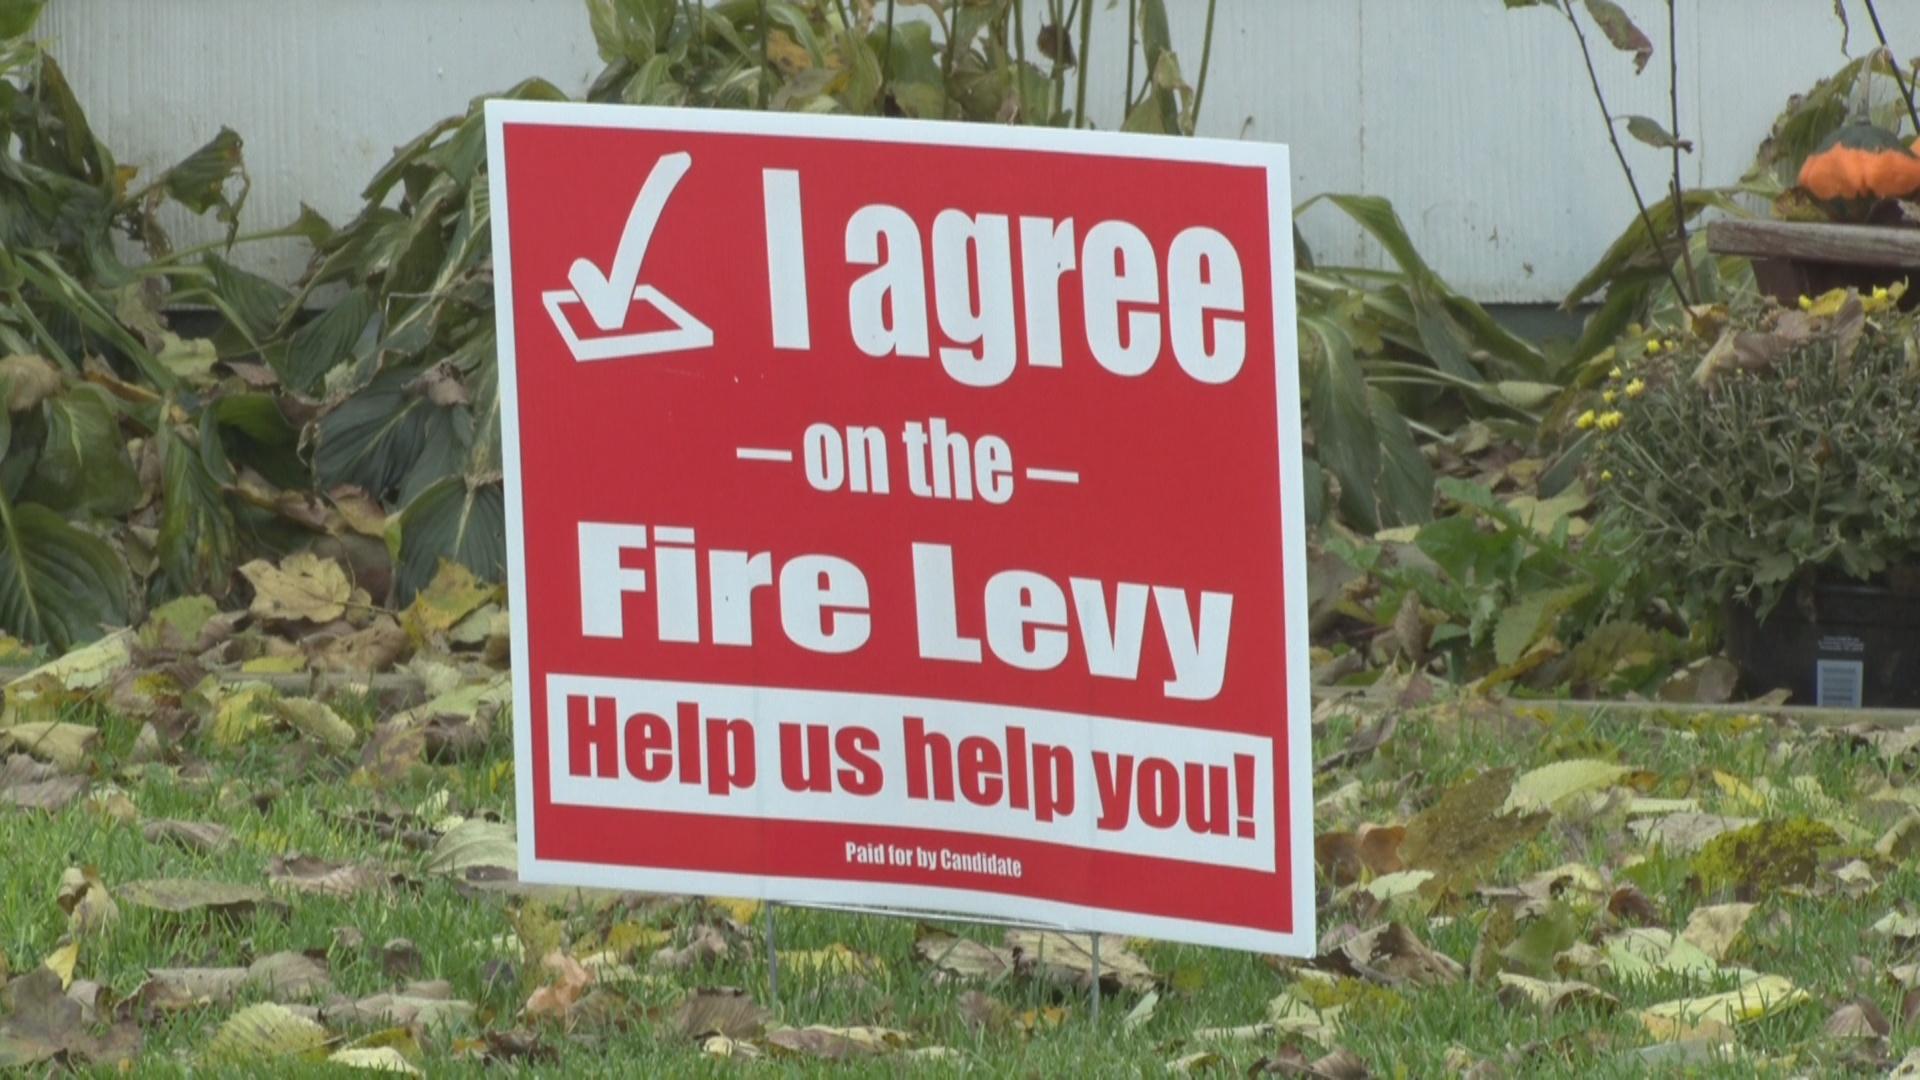 fire levy_1541130115121.jpg.jpg